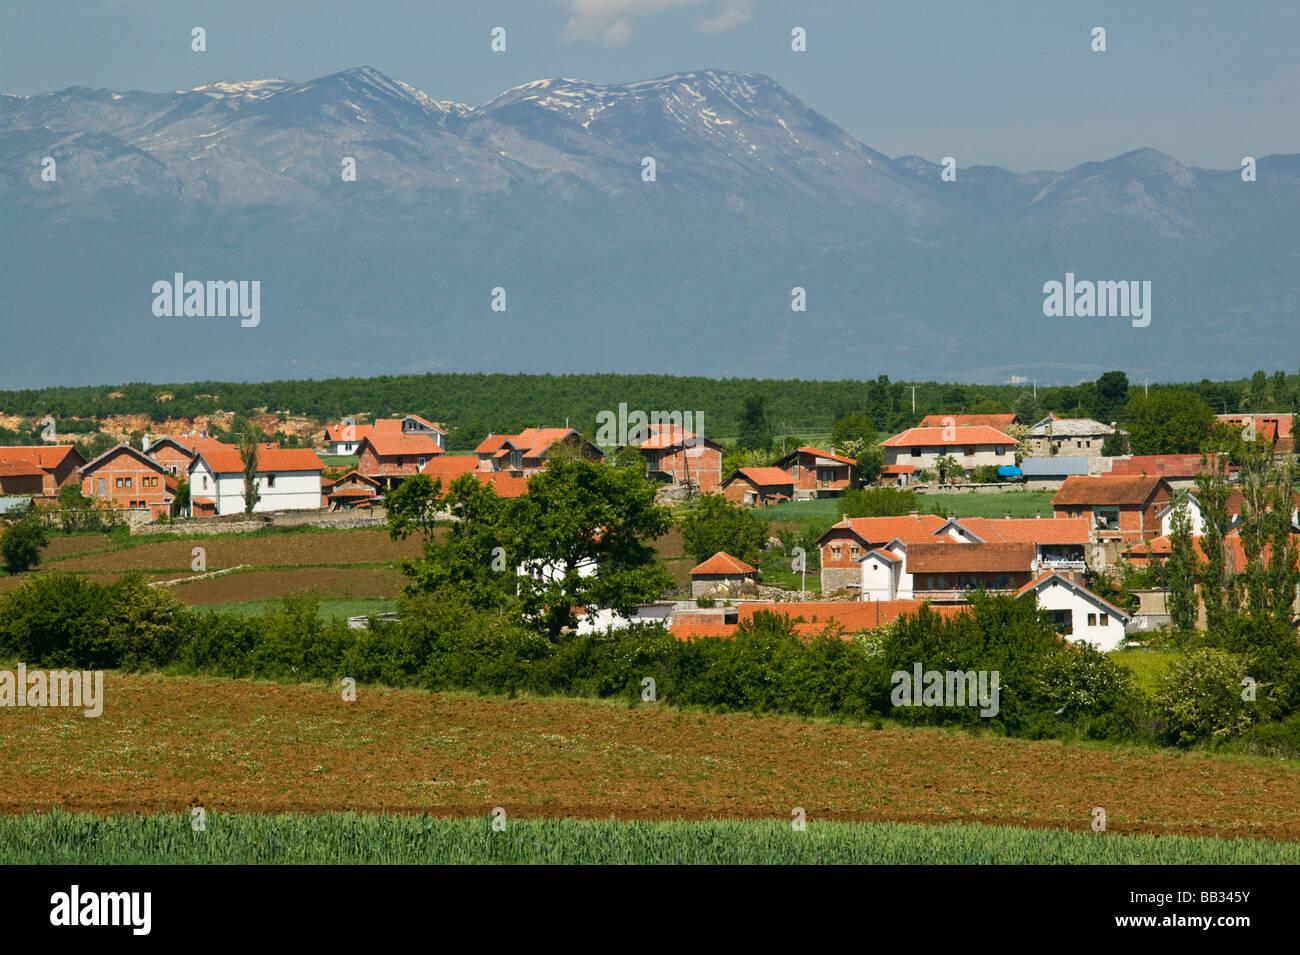 KOSOVO, Balince. View of Muslim village of BALINCE rebuilt after Kosovo War (1998-1999) Stock Photo